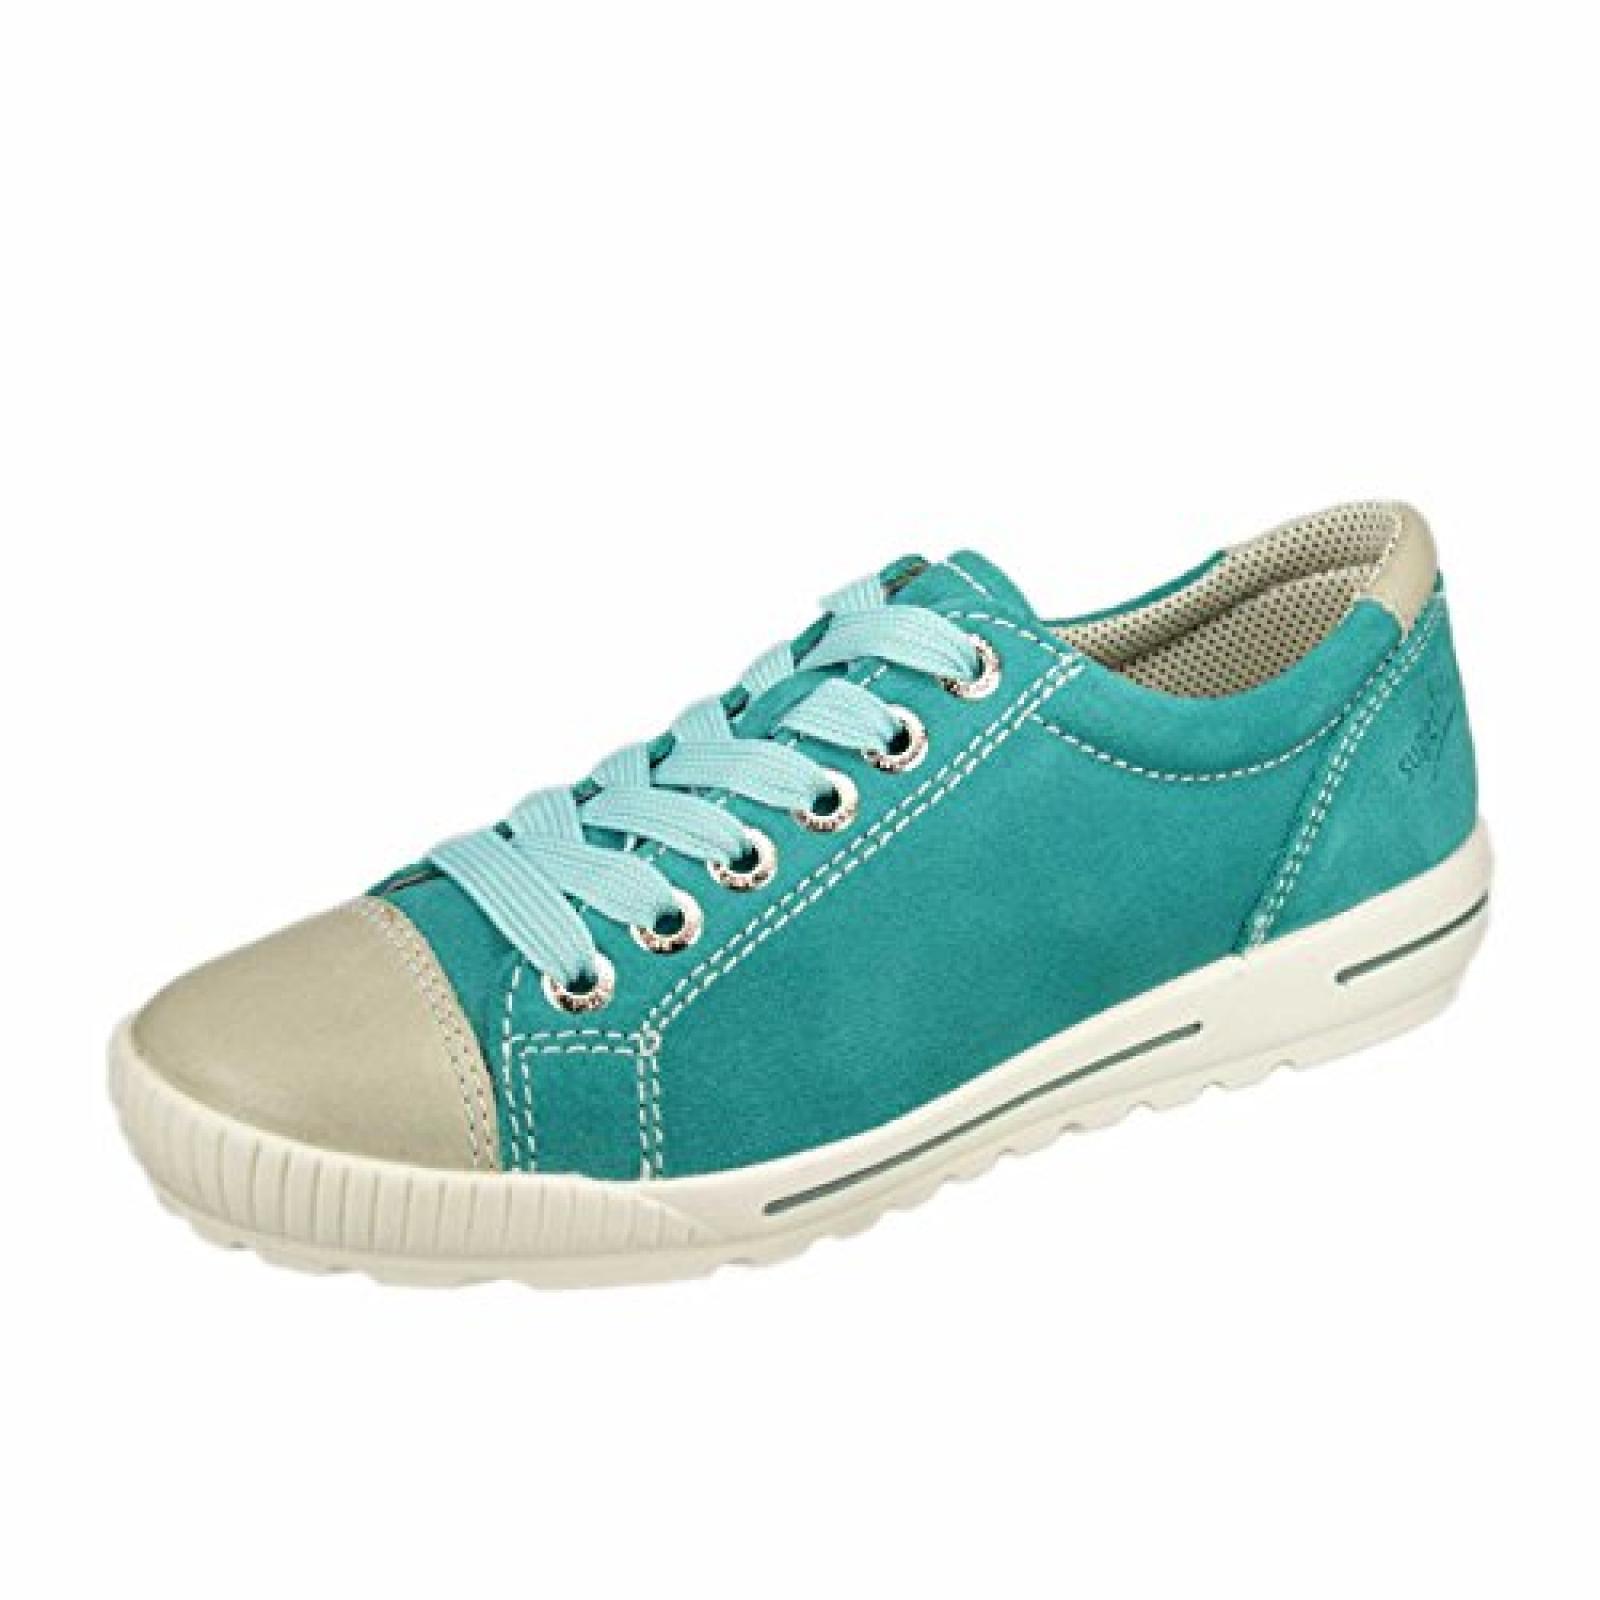 Superfit SIENA Mädchen Sneakers